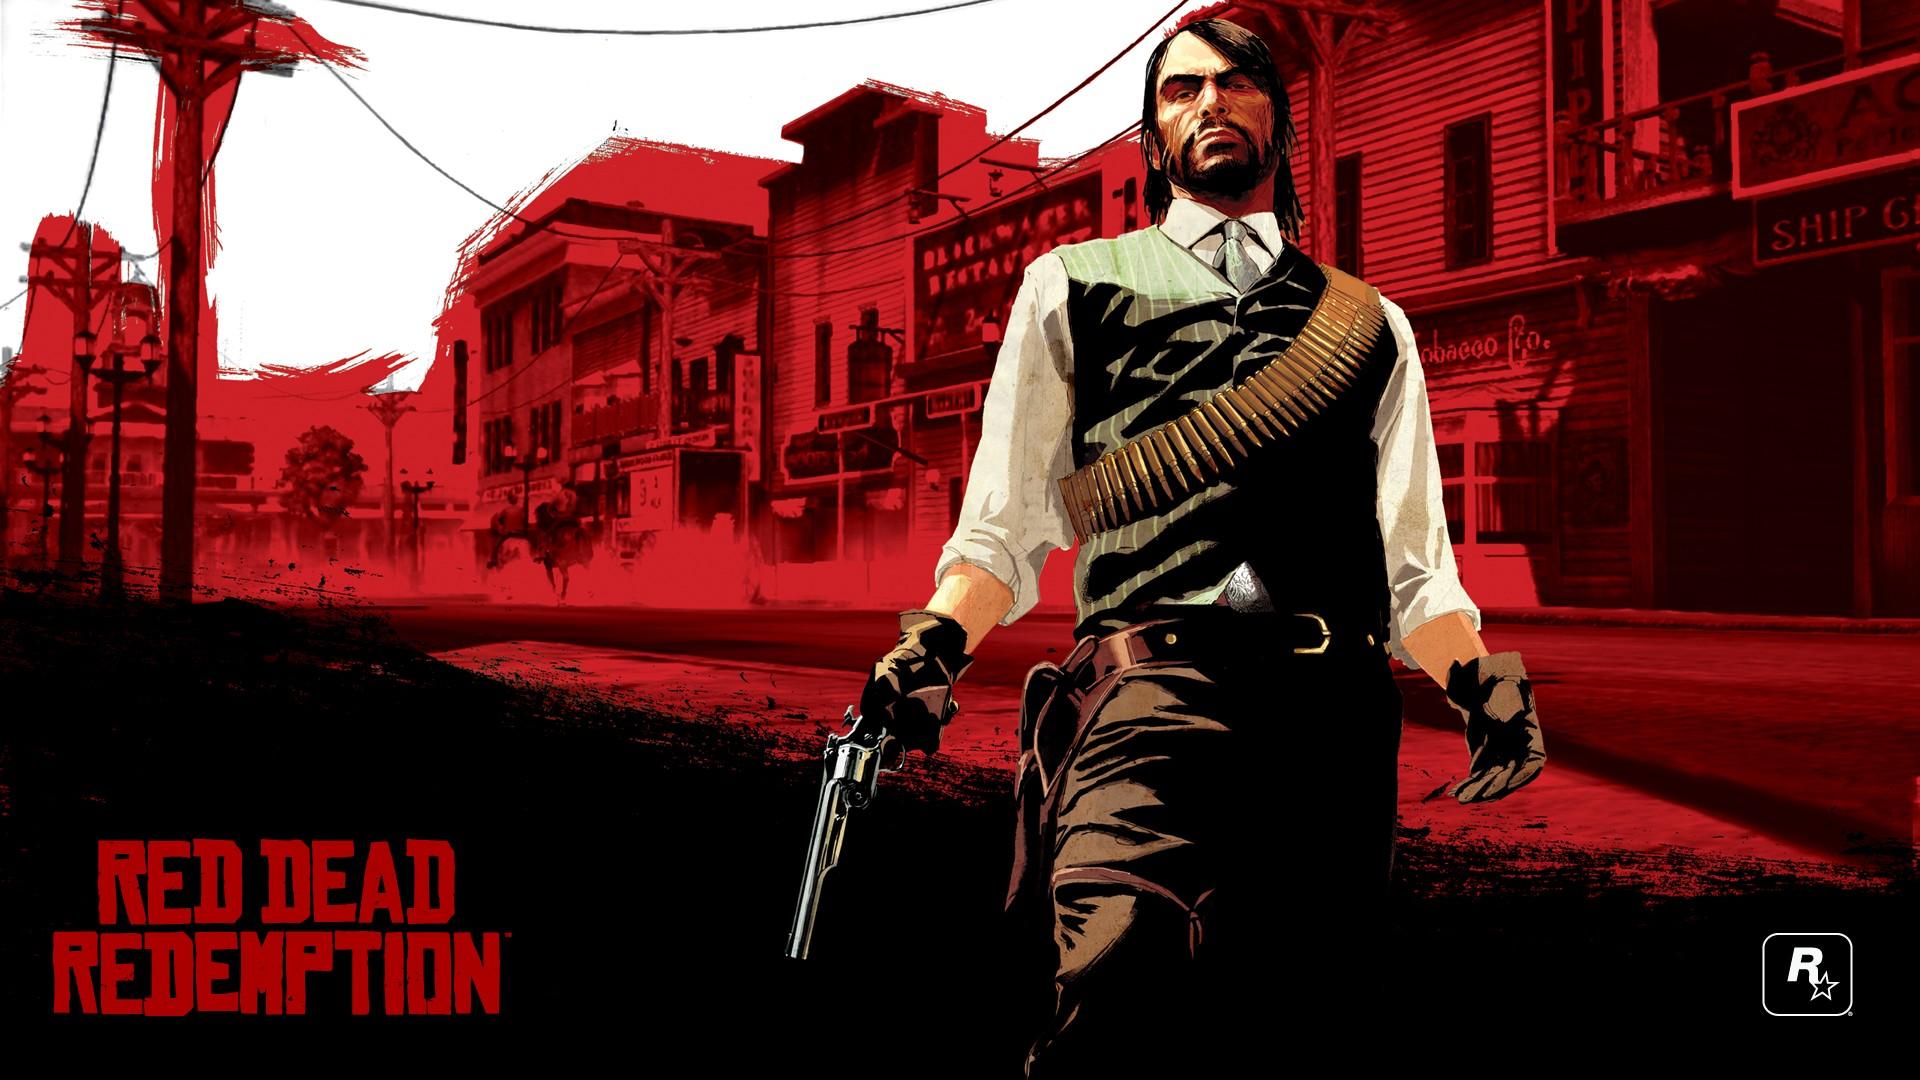 Wallpaper Illustration Poster Red Dead Redemption